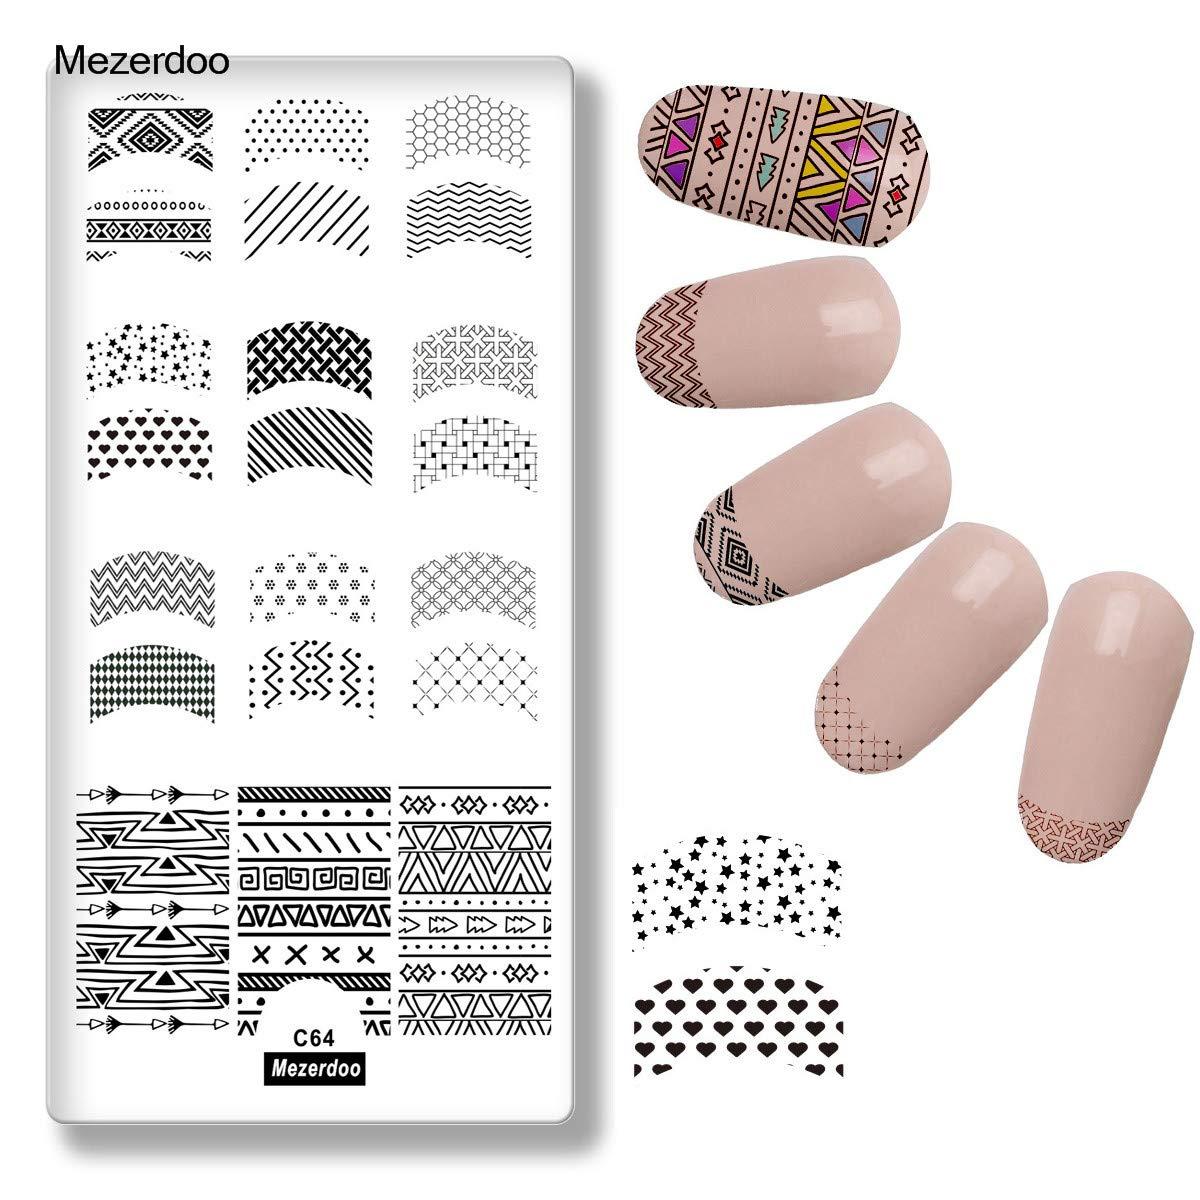 1Pcs French Nail Stamping Plates Tattoo Printing Templates Geometric Diy Elegant Rectangle Nail Art Stamp Tool Manicure Image Stencil Mezerdoo